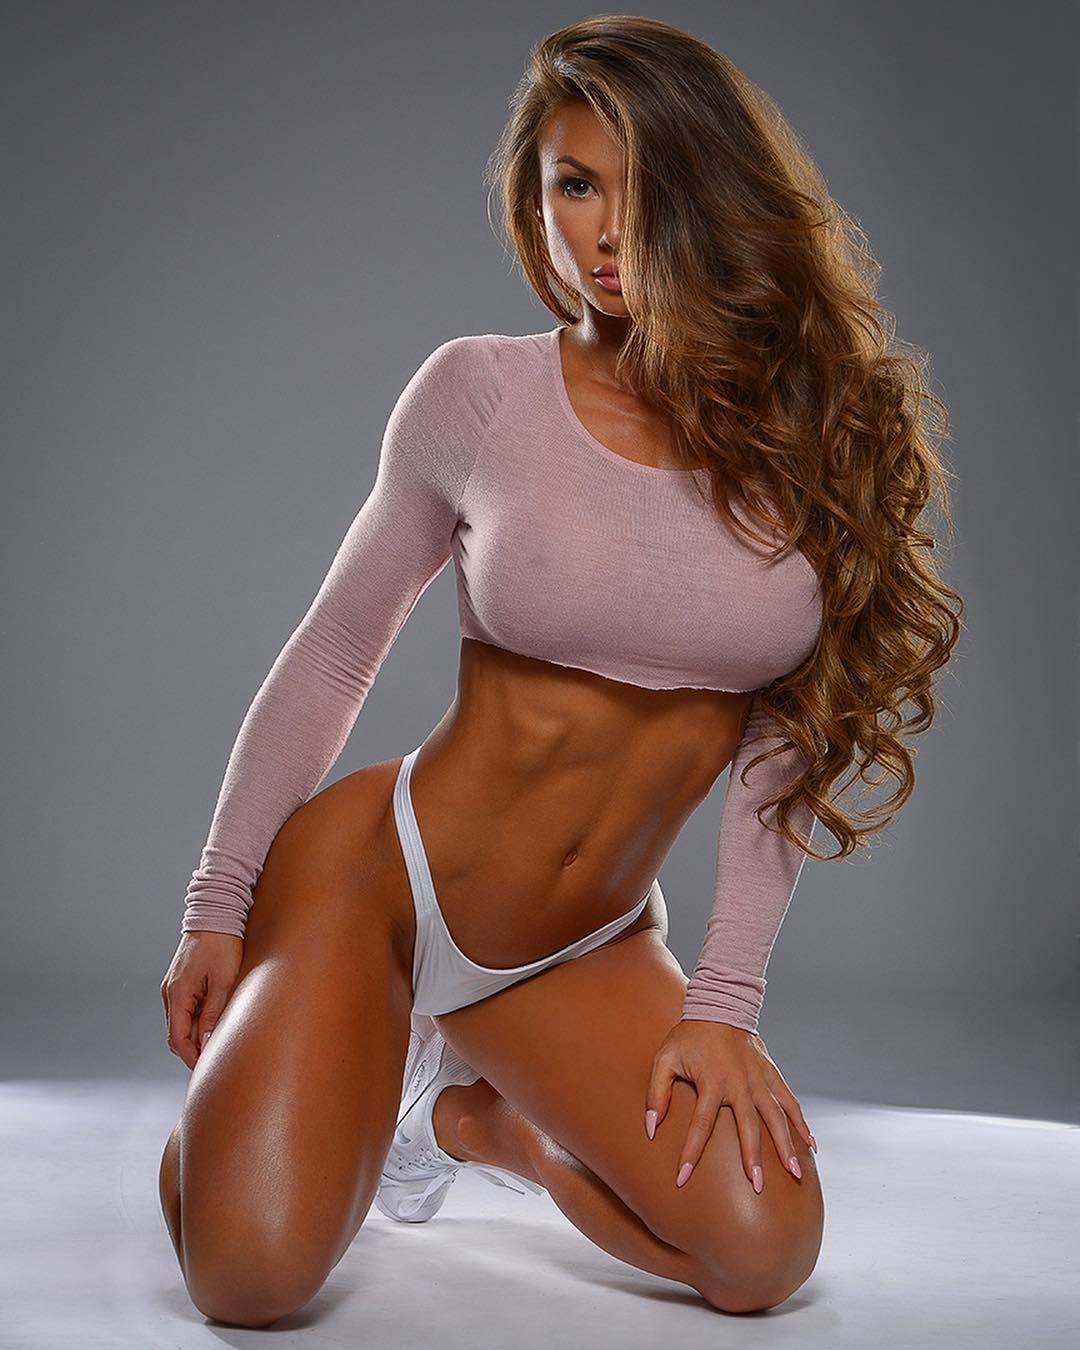 Hot nud fitness women bikini — img 6